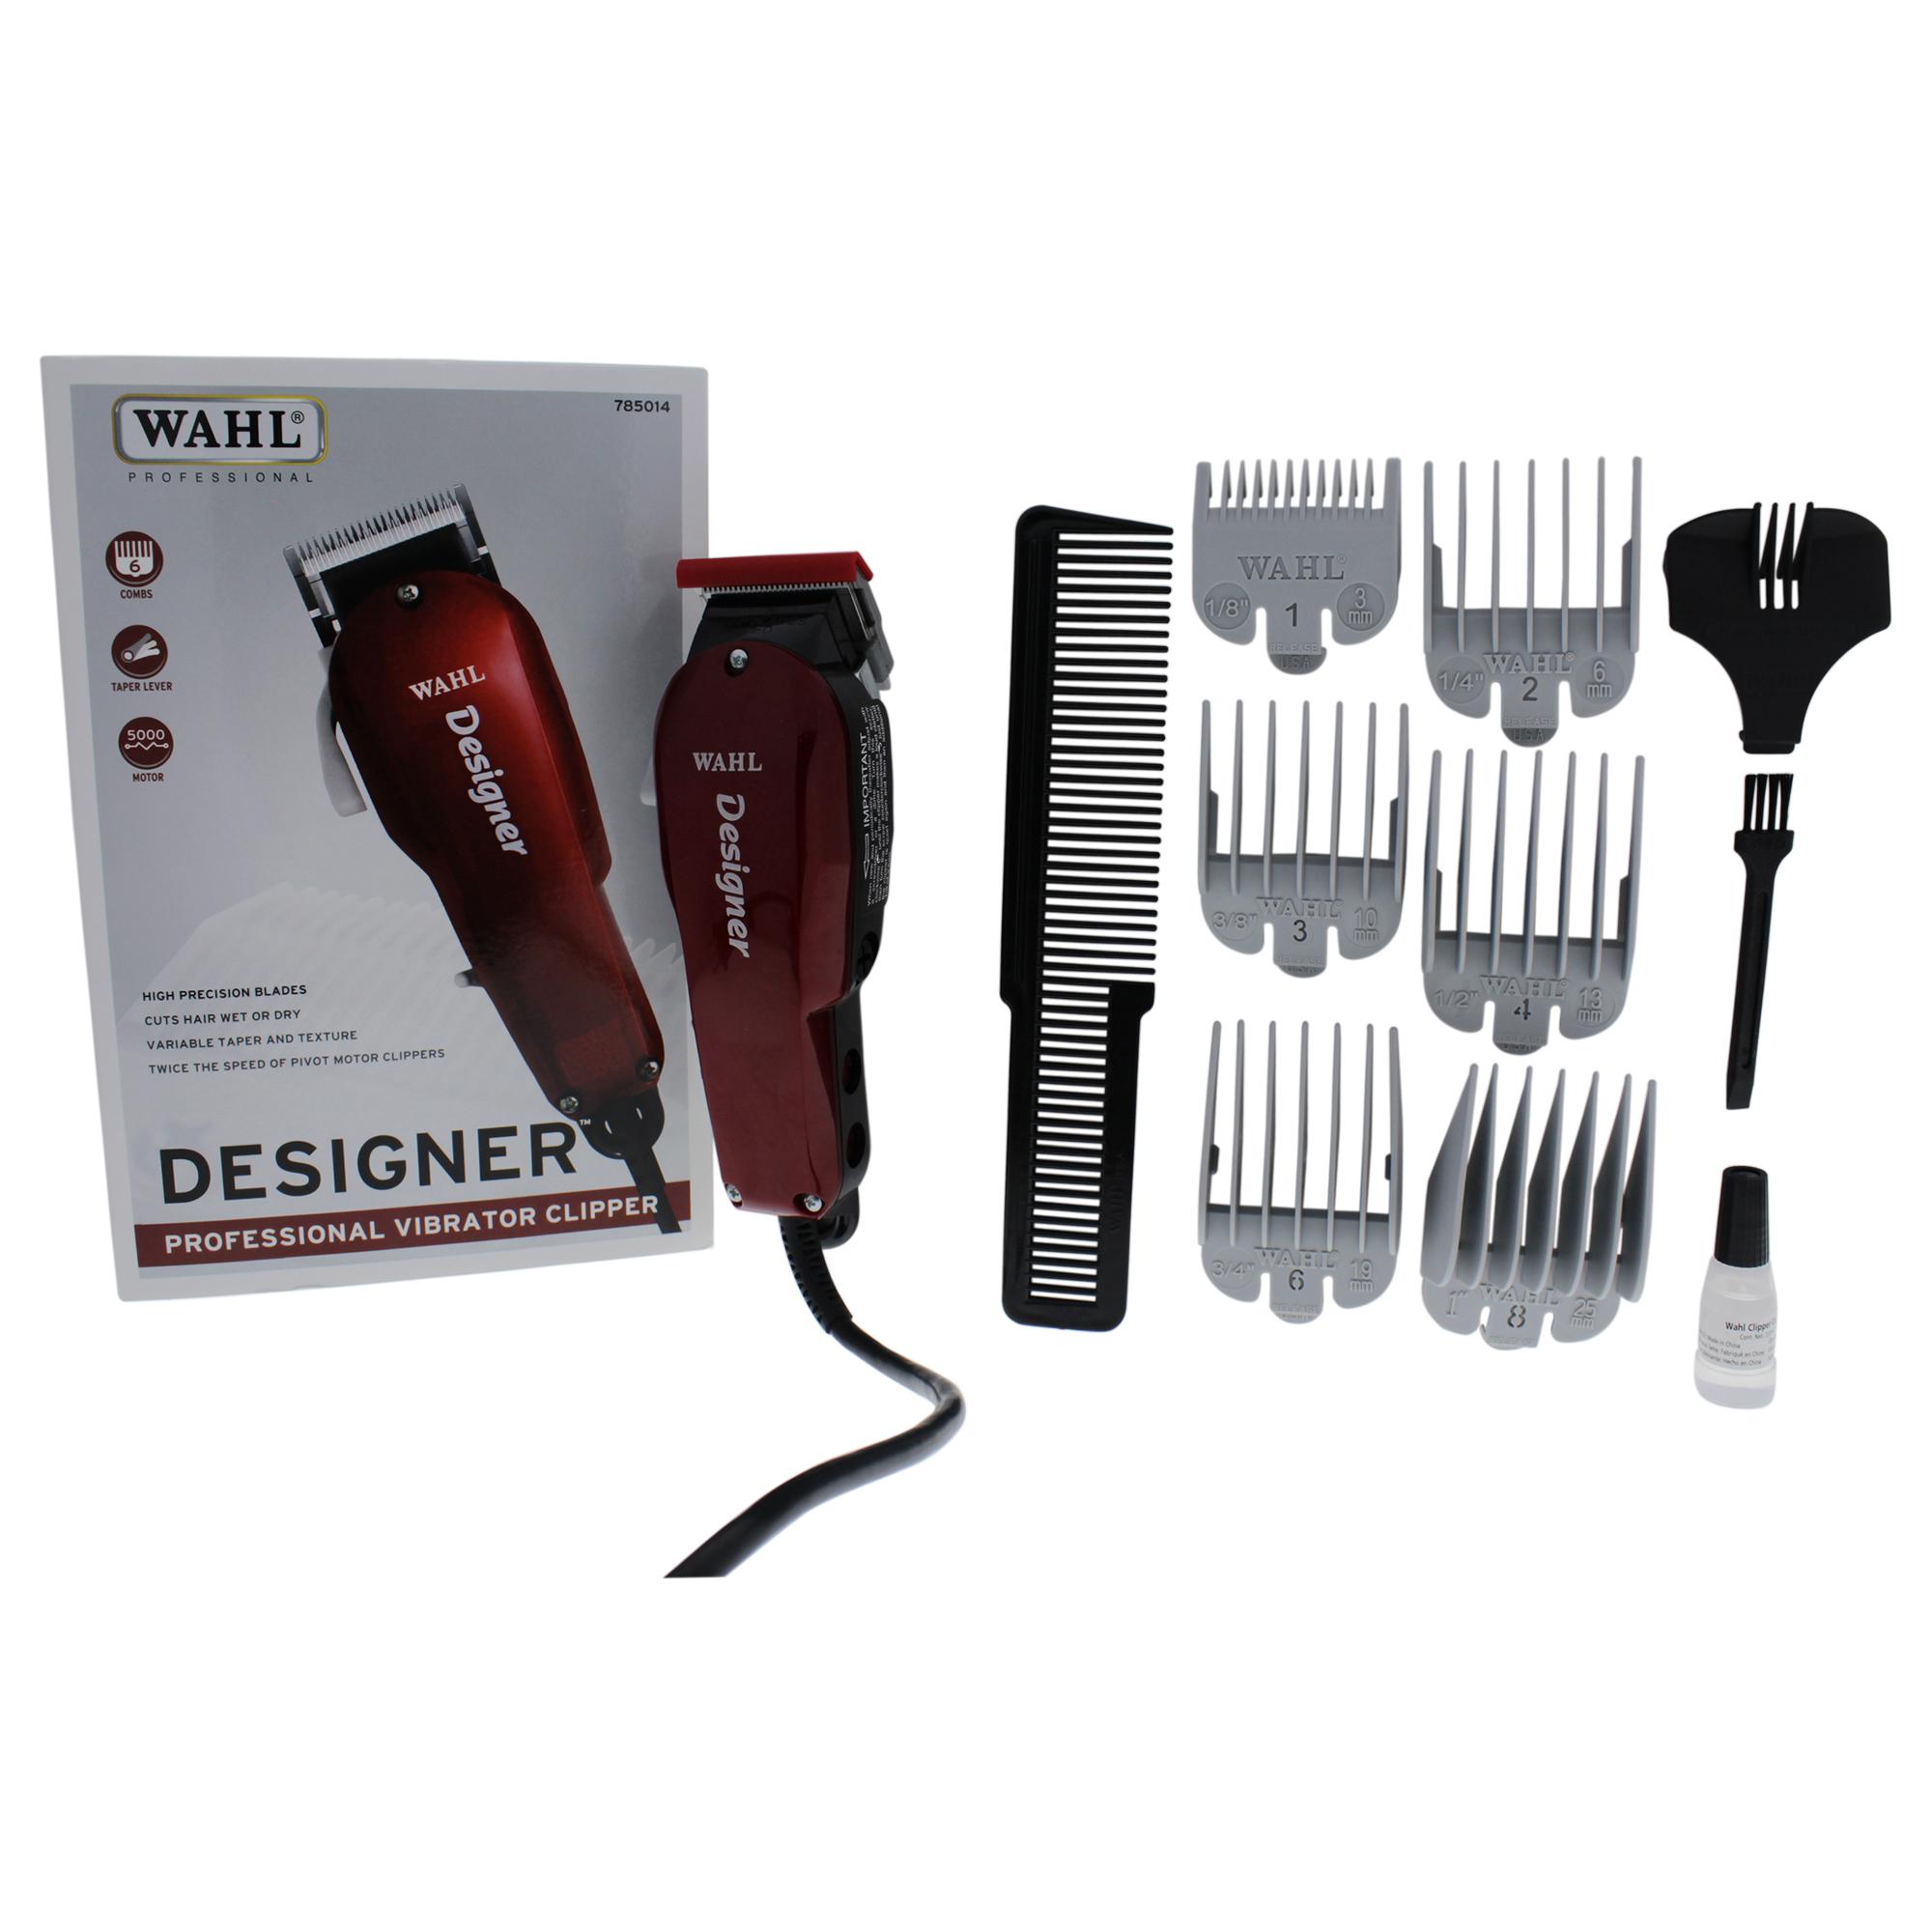 WAHL Professional Designer Professional Vibrator Clipper - Model # 8355-400 - Red - 1 Pc Clipper